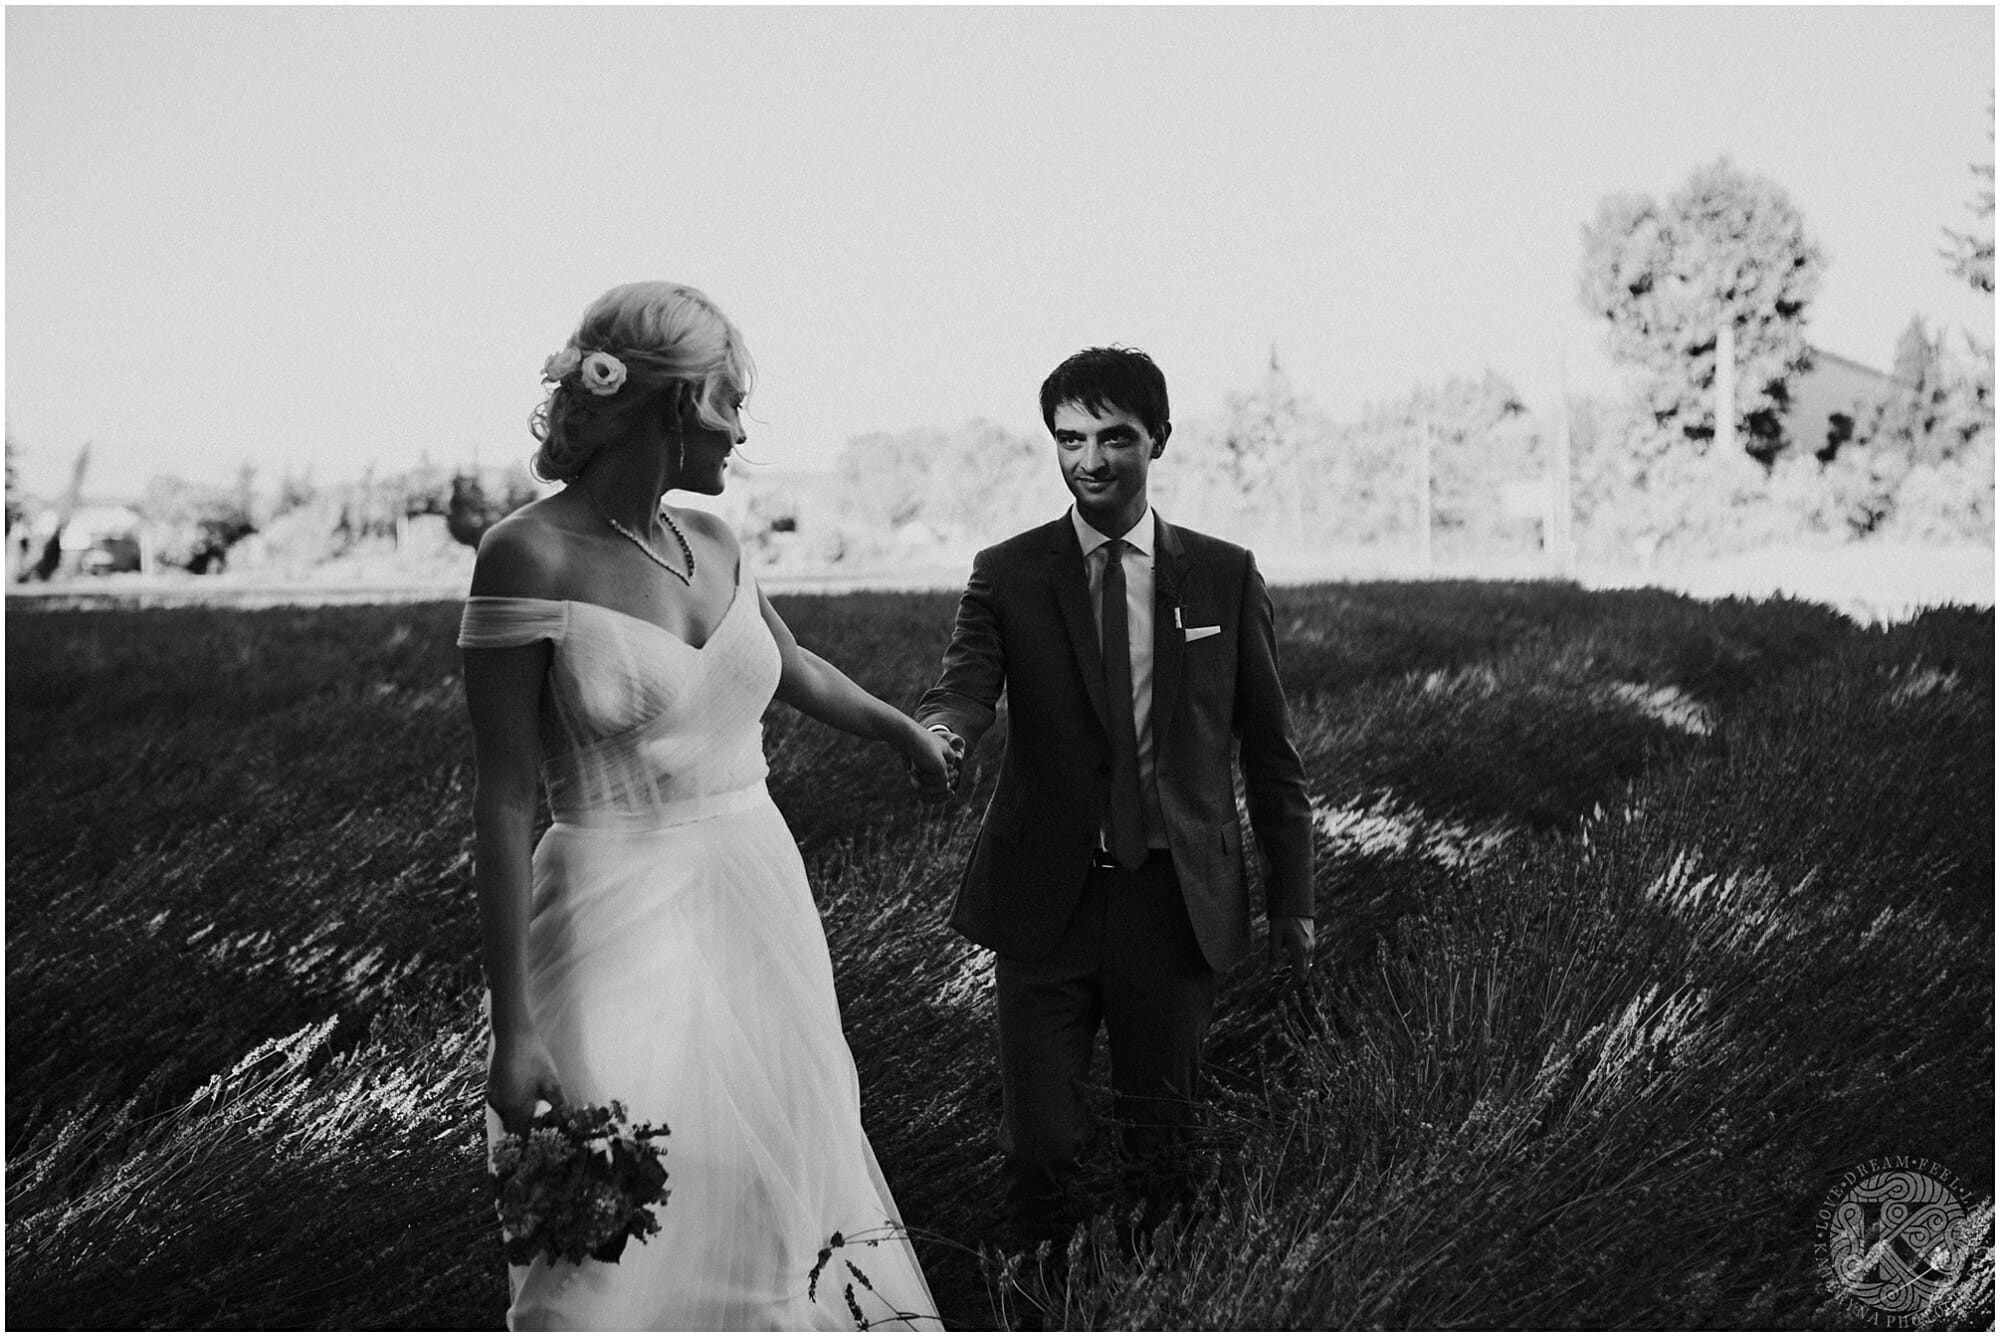 Kateryna-photos-photographe-mariage-chateau-des-3-fontaines-provence-avignon-vaucluse-sud_0089.jpg